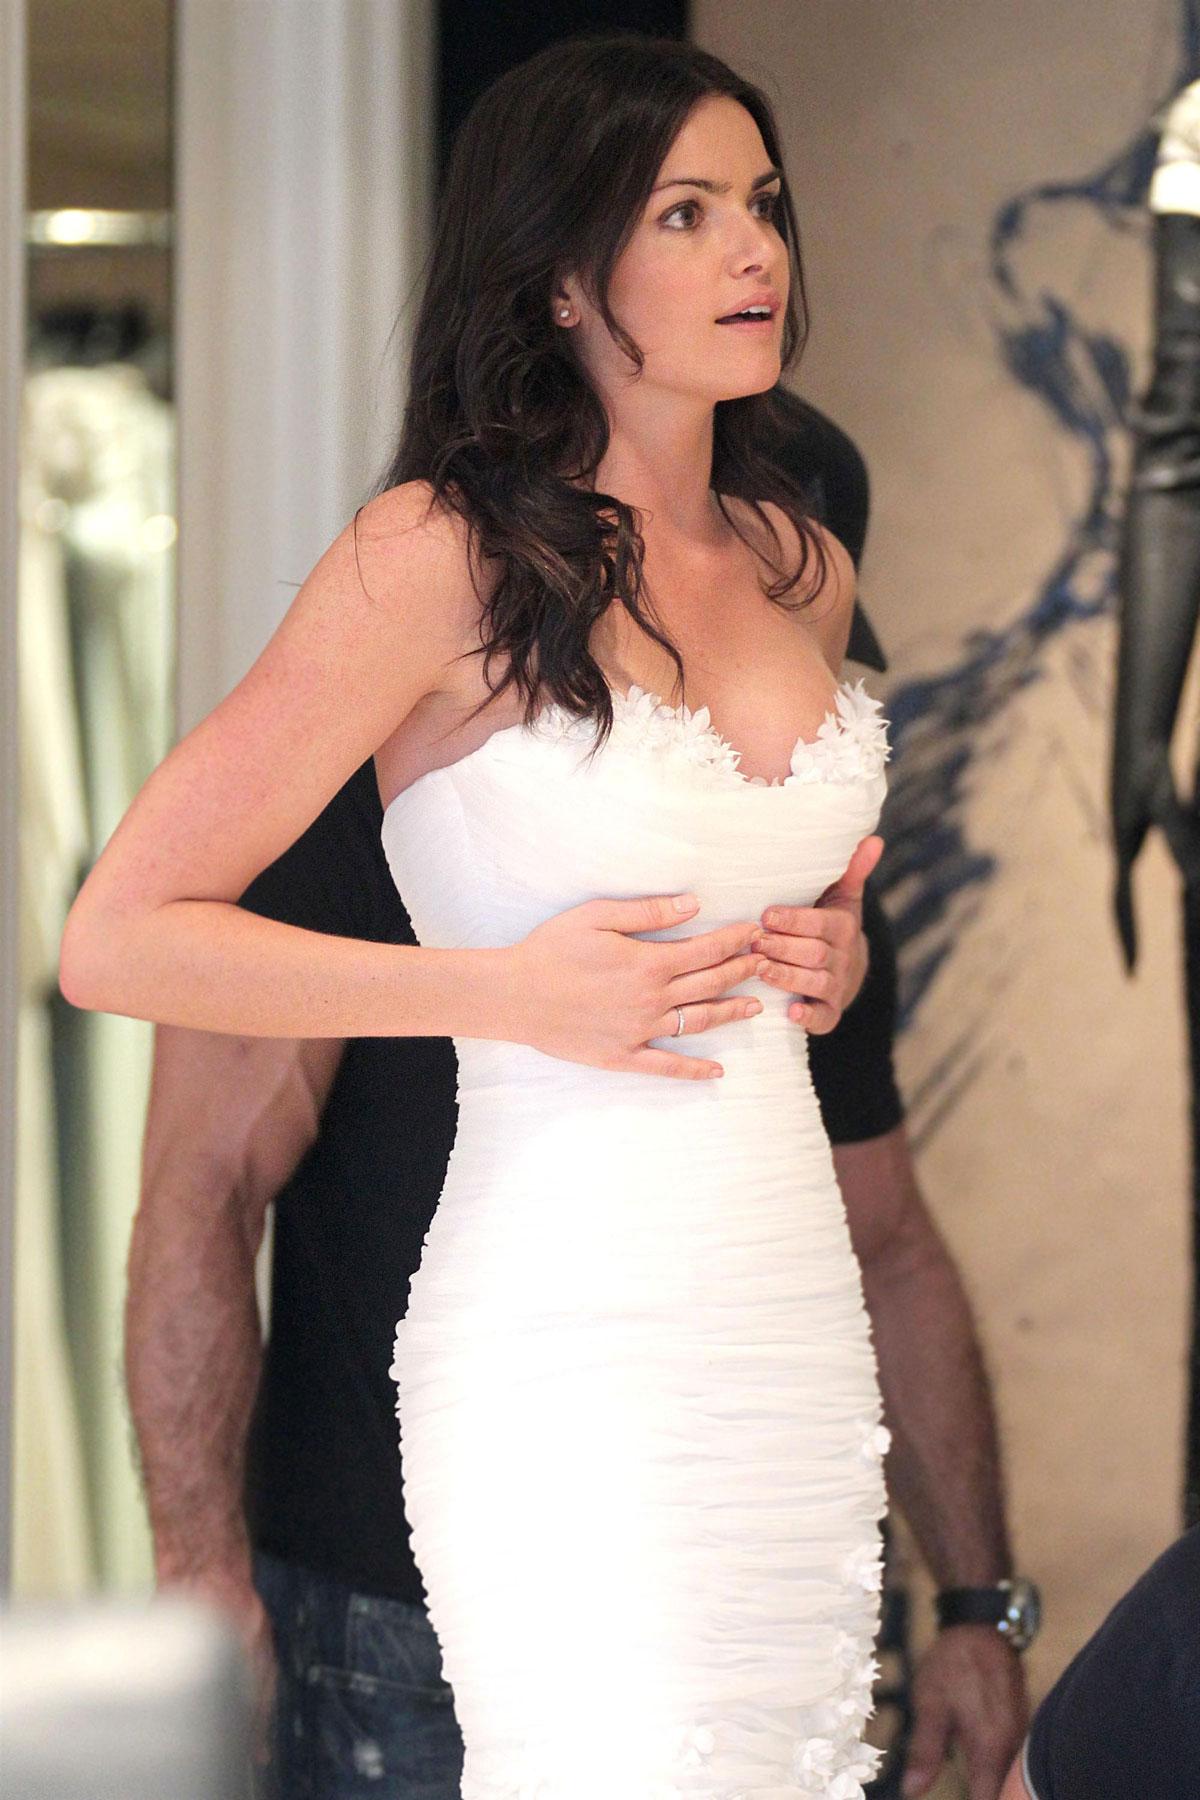 Courtney Robertson in Wedding Dresses - HawtCelebs